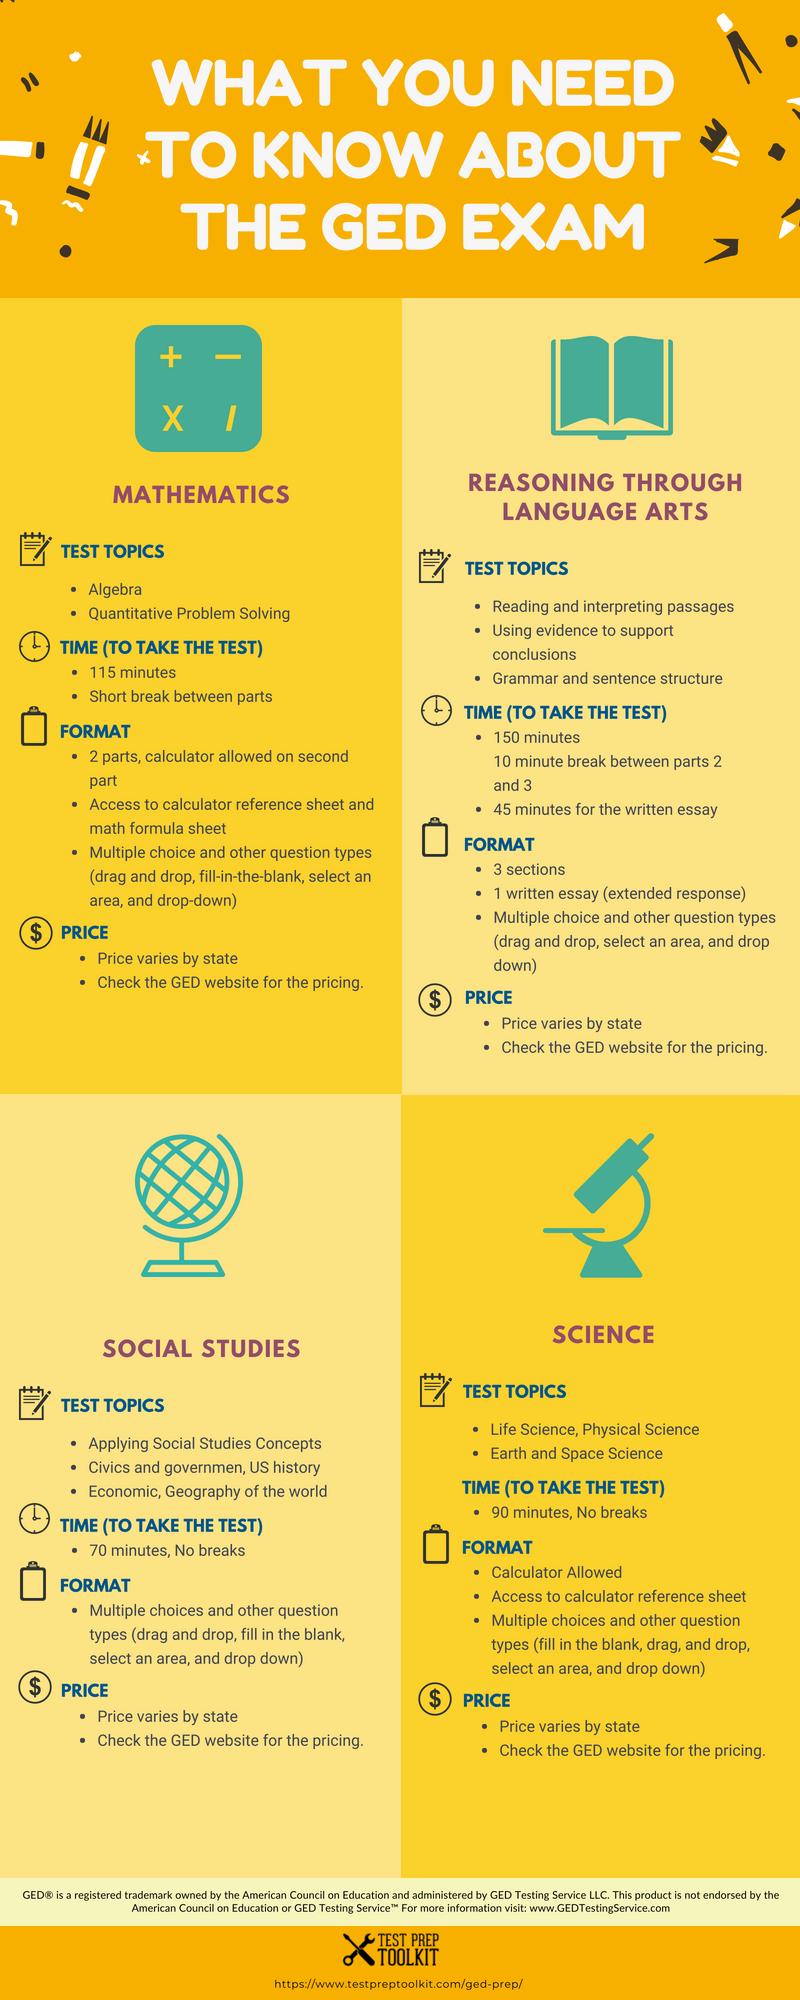 New Ged Infographic Https Www Testpreptoolkit Com Ged Prep Study Ged Testpreptoolkit Gedstudy Gedp Ged Study Guide Ged Study School Study Tips [ 2000 x 800 Pixel ]